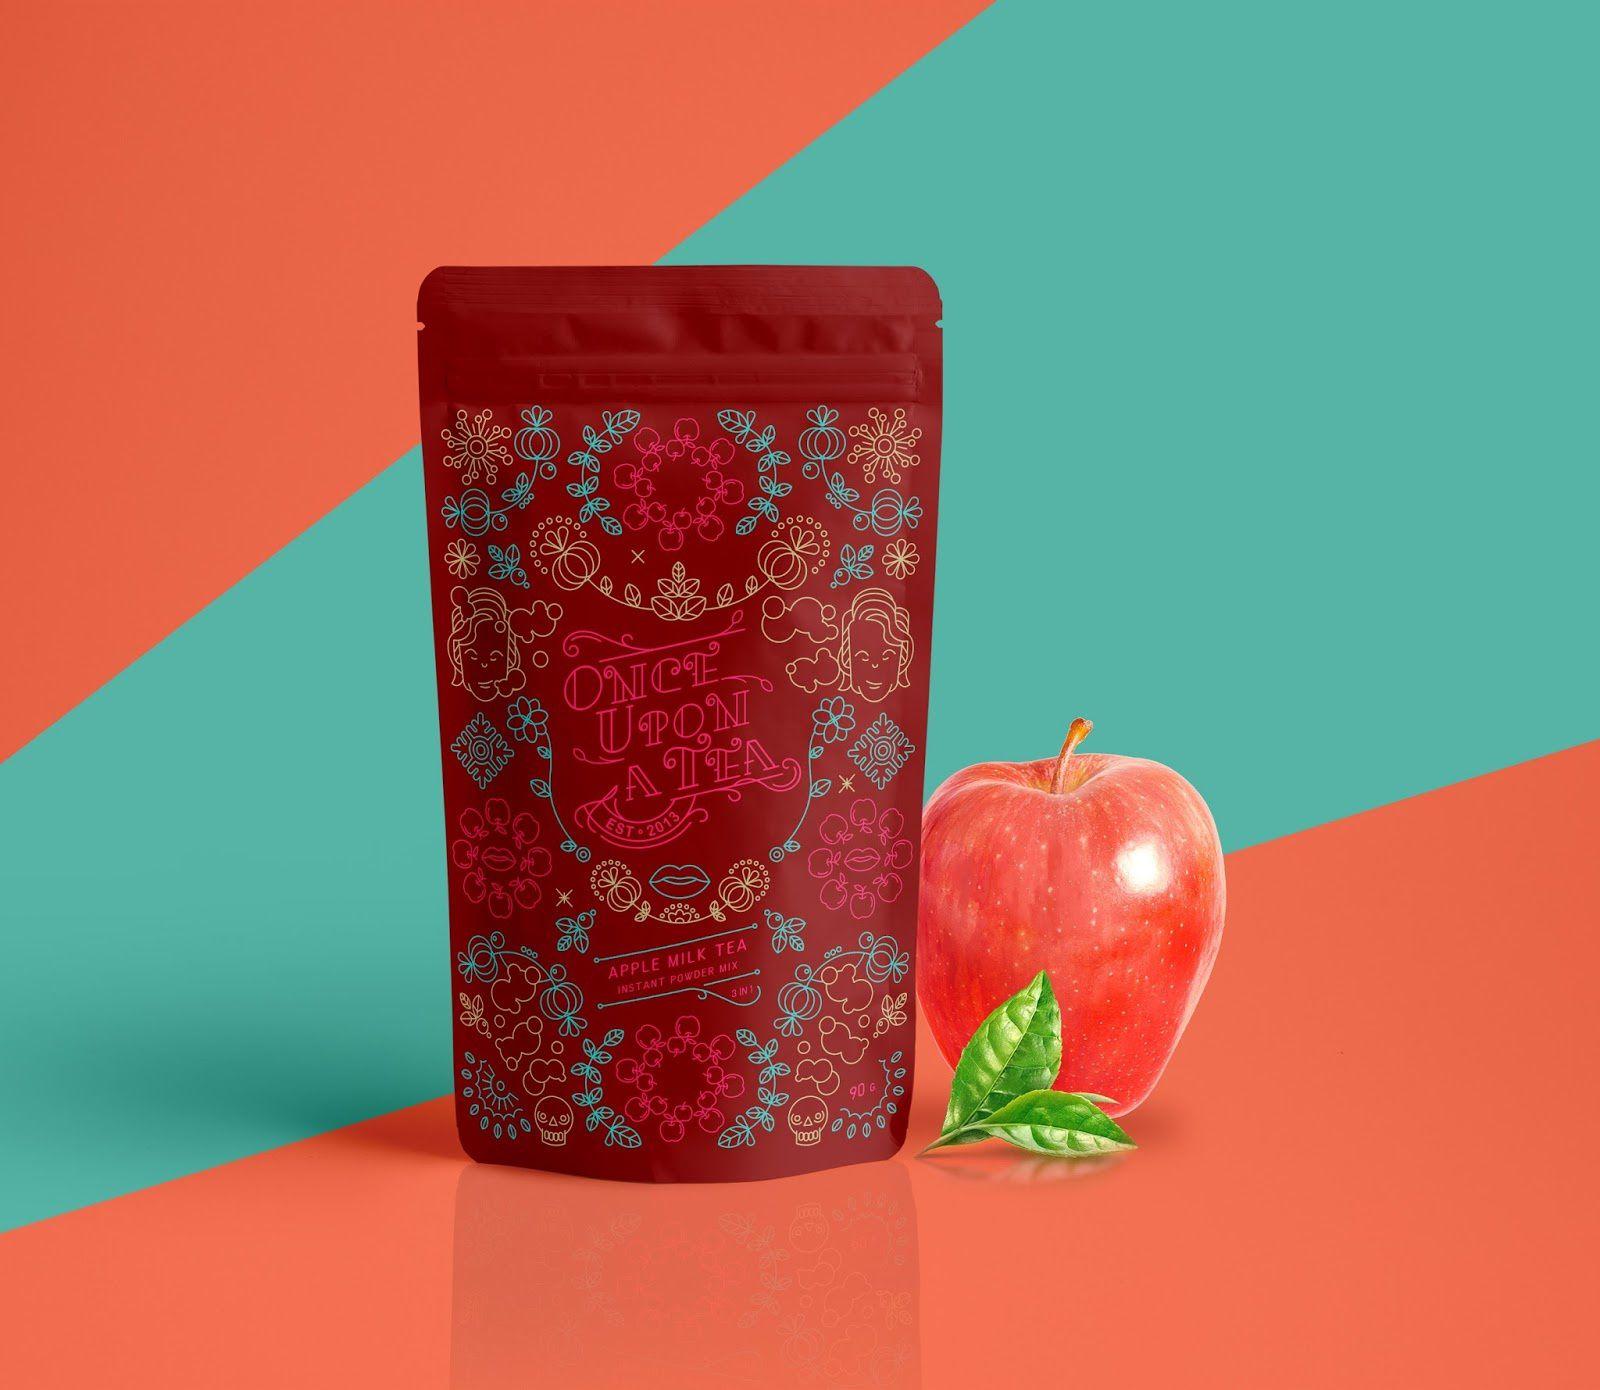 Aroma TEA - Once Upon a Tea (thés aromatisés aux fruits) I Design : WONDER MACHINE STUDIO, Thaïlande (février 2017)